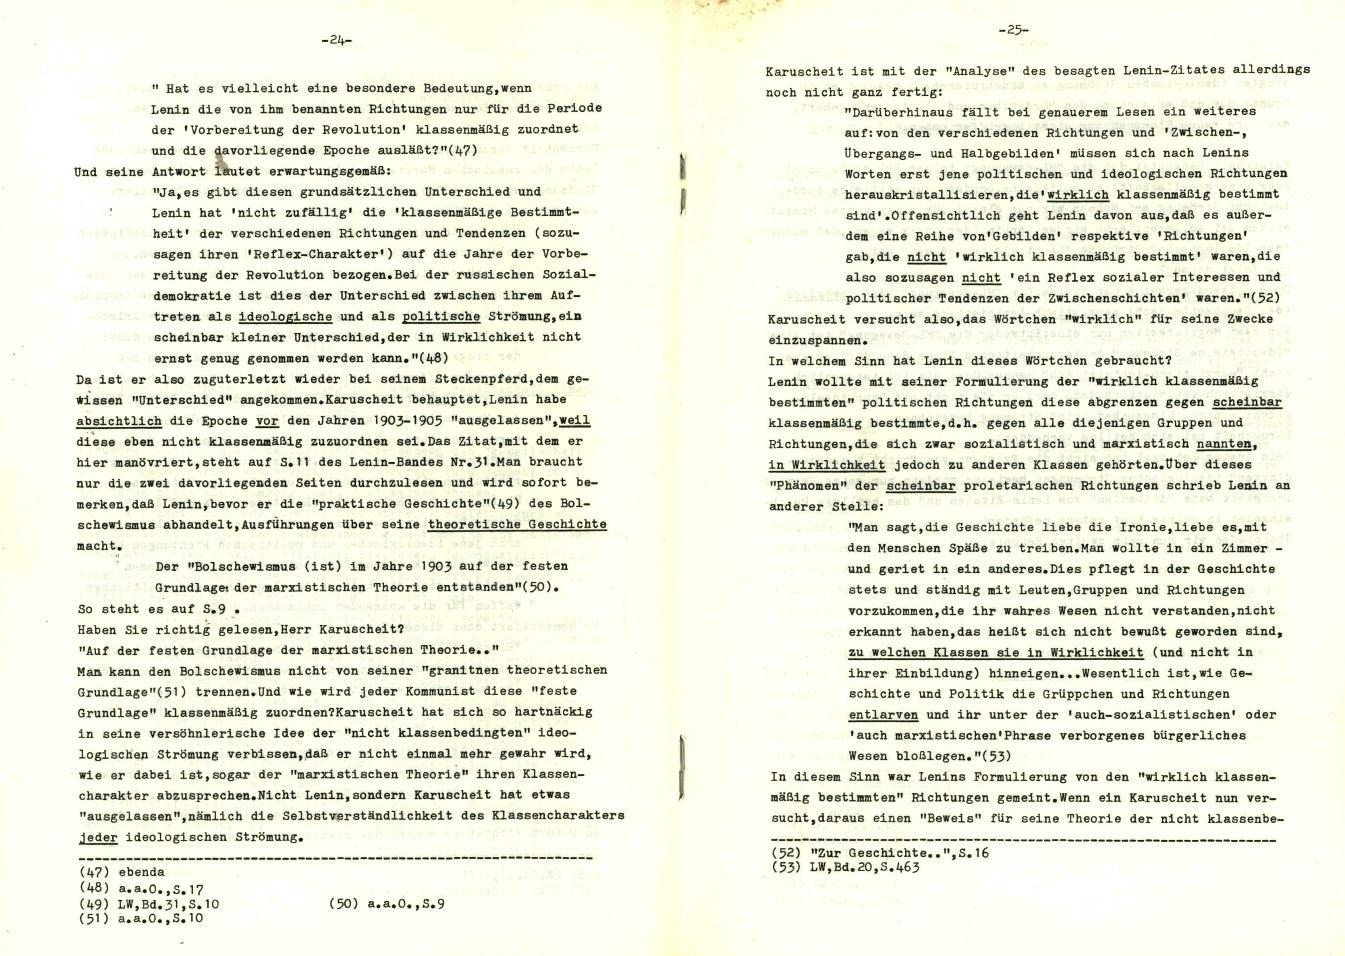 Muenchen_Kampf_dem_Revisionismus_1979_09_13